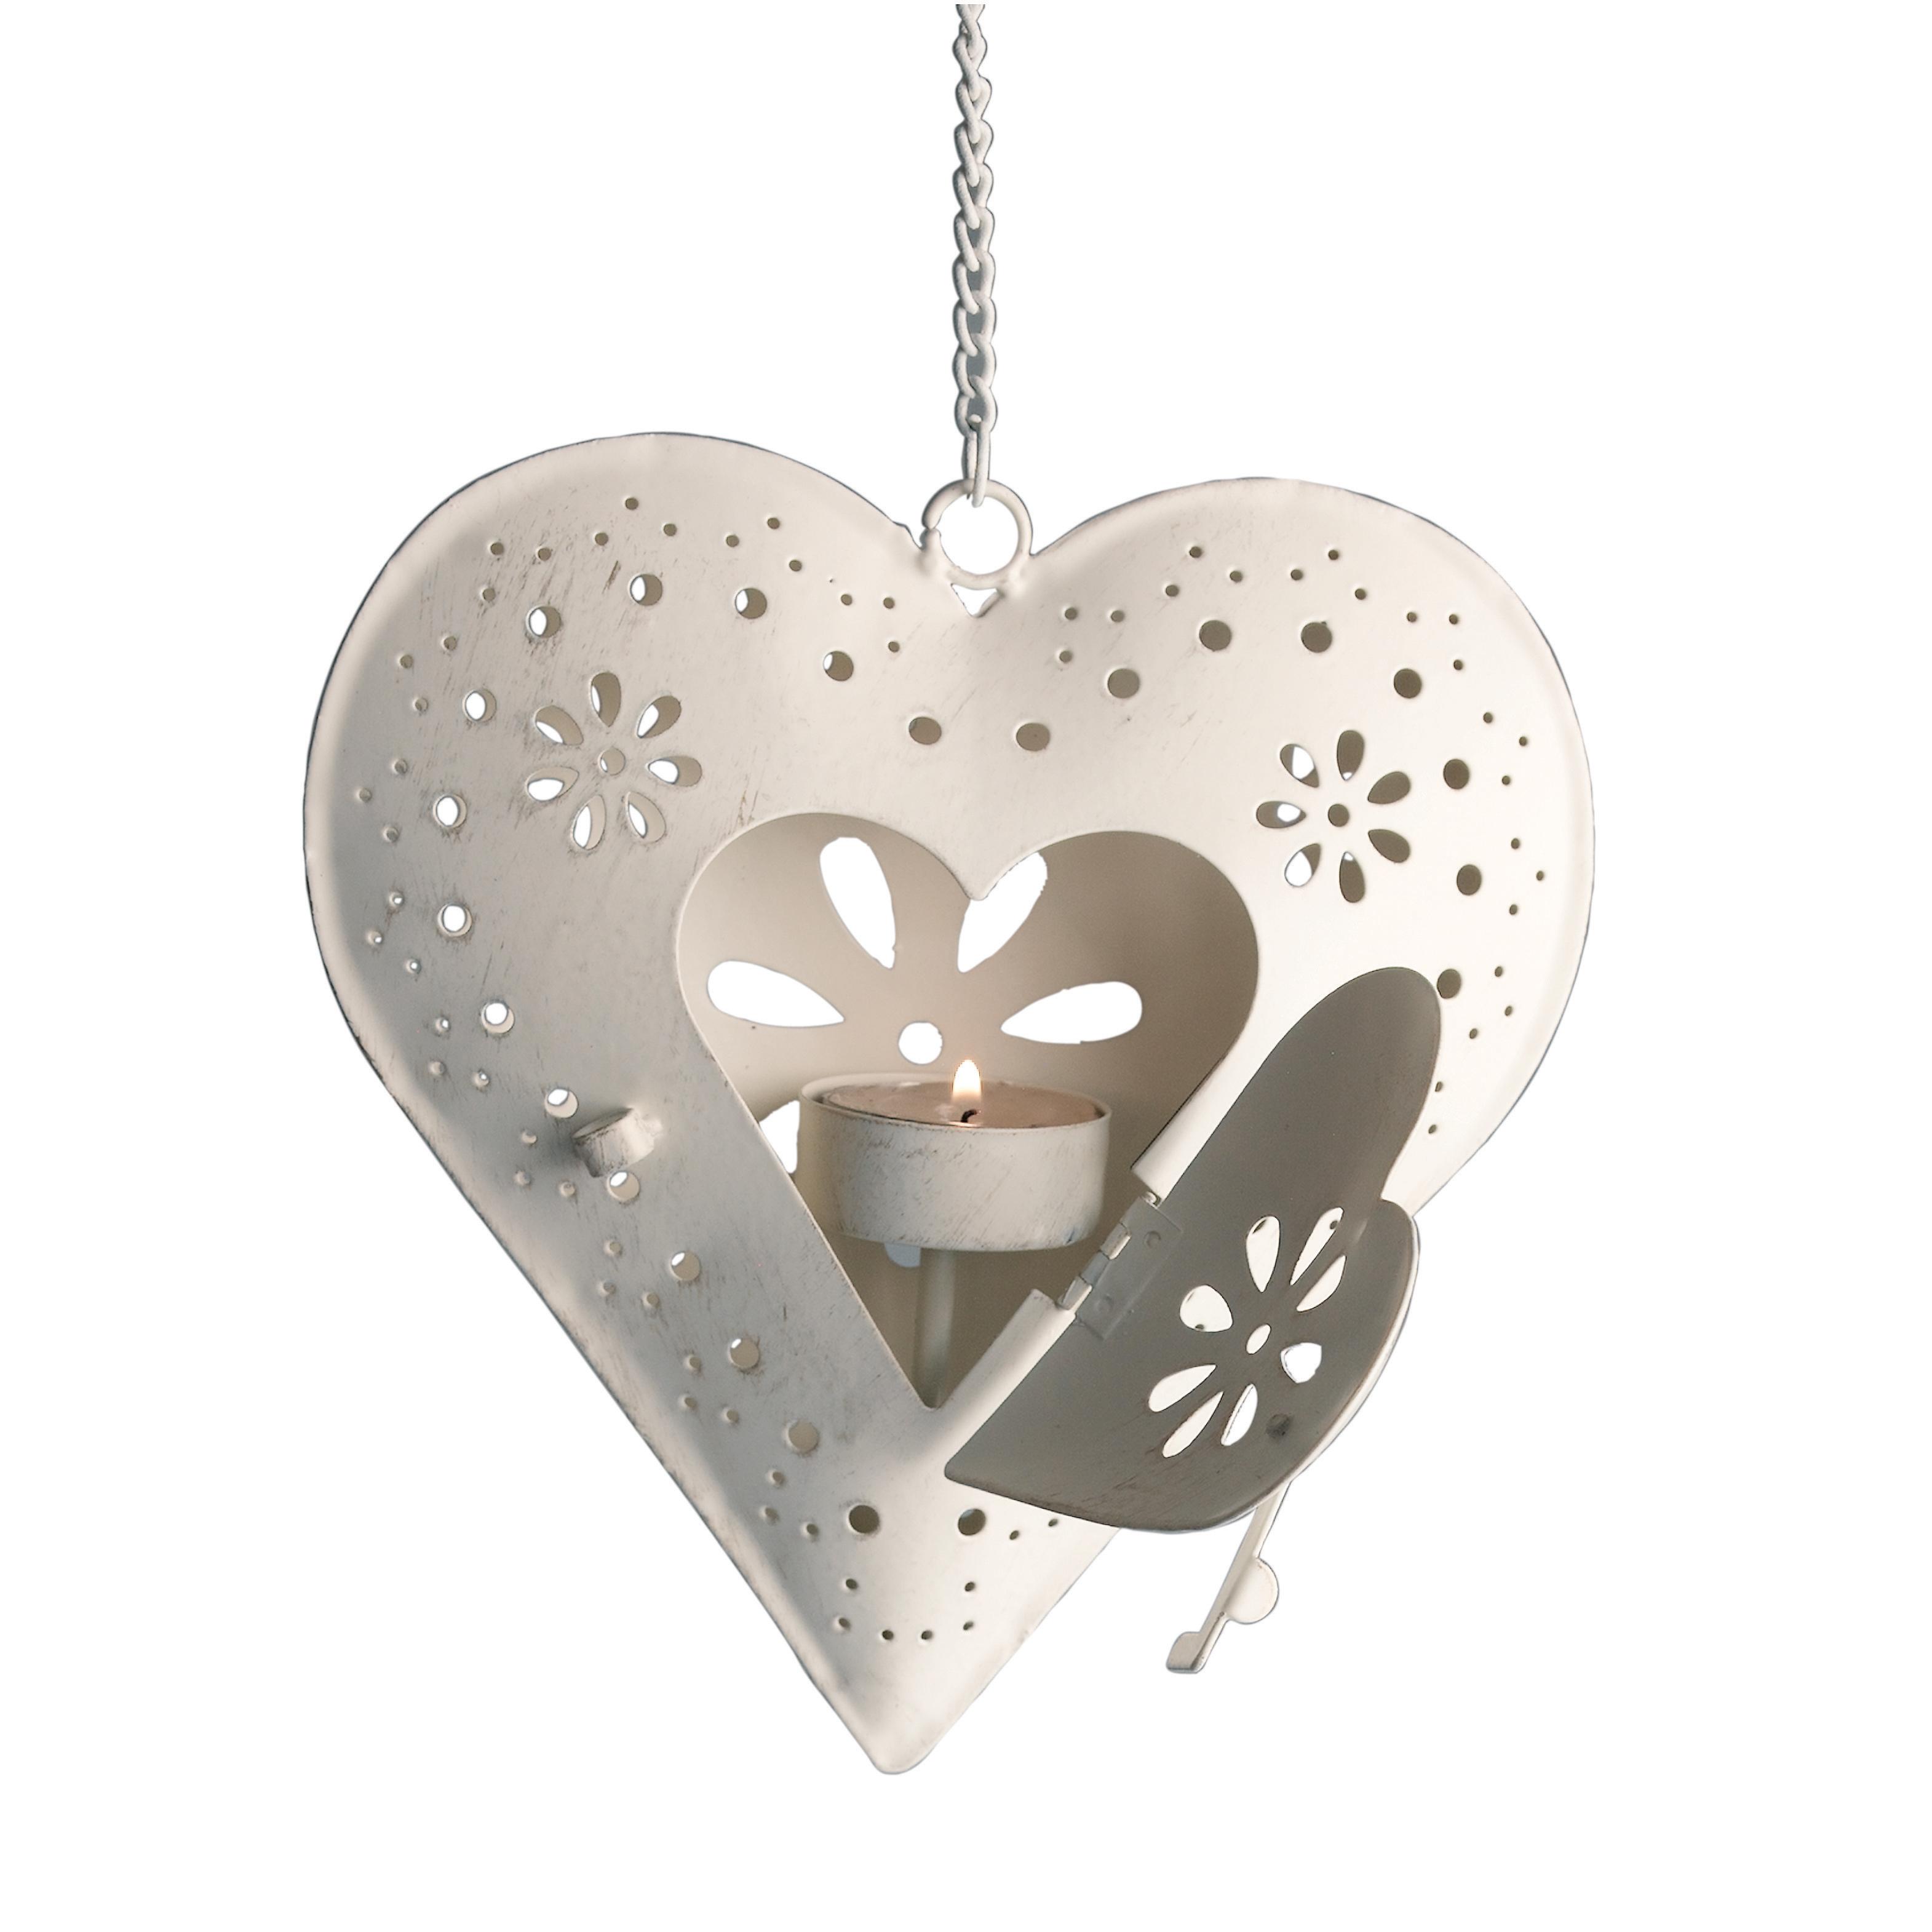 ANTIQUE CREAM HANGING HEART TEA LIGHT CANDLE HOLDER WEDDING DECOR